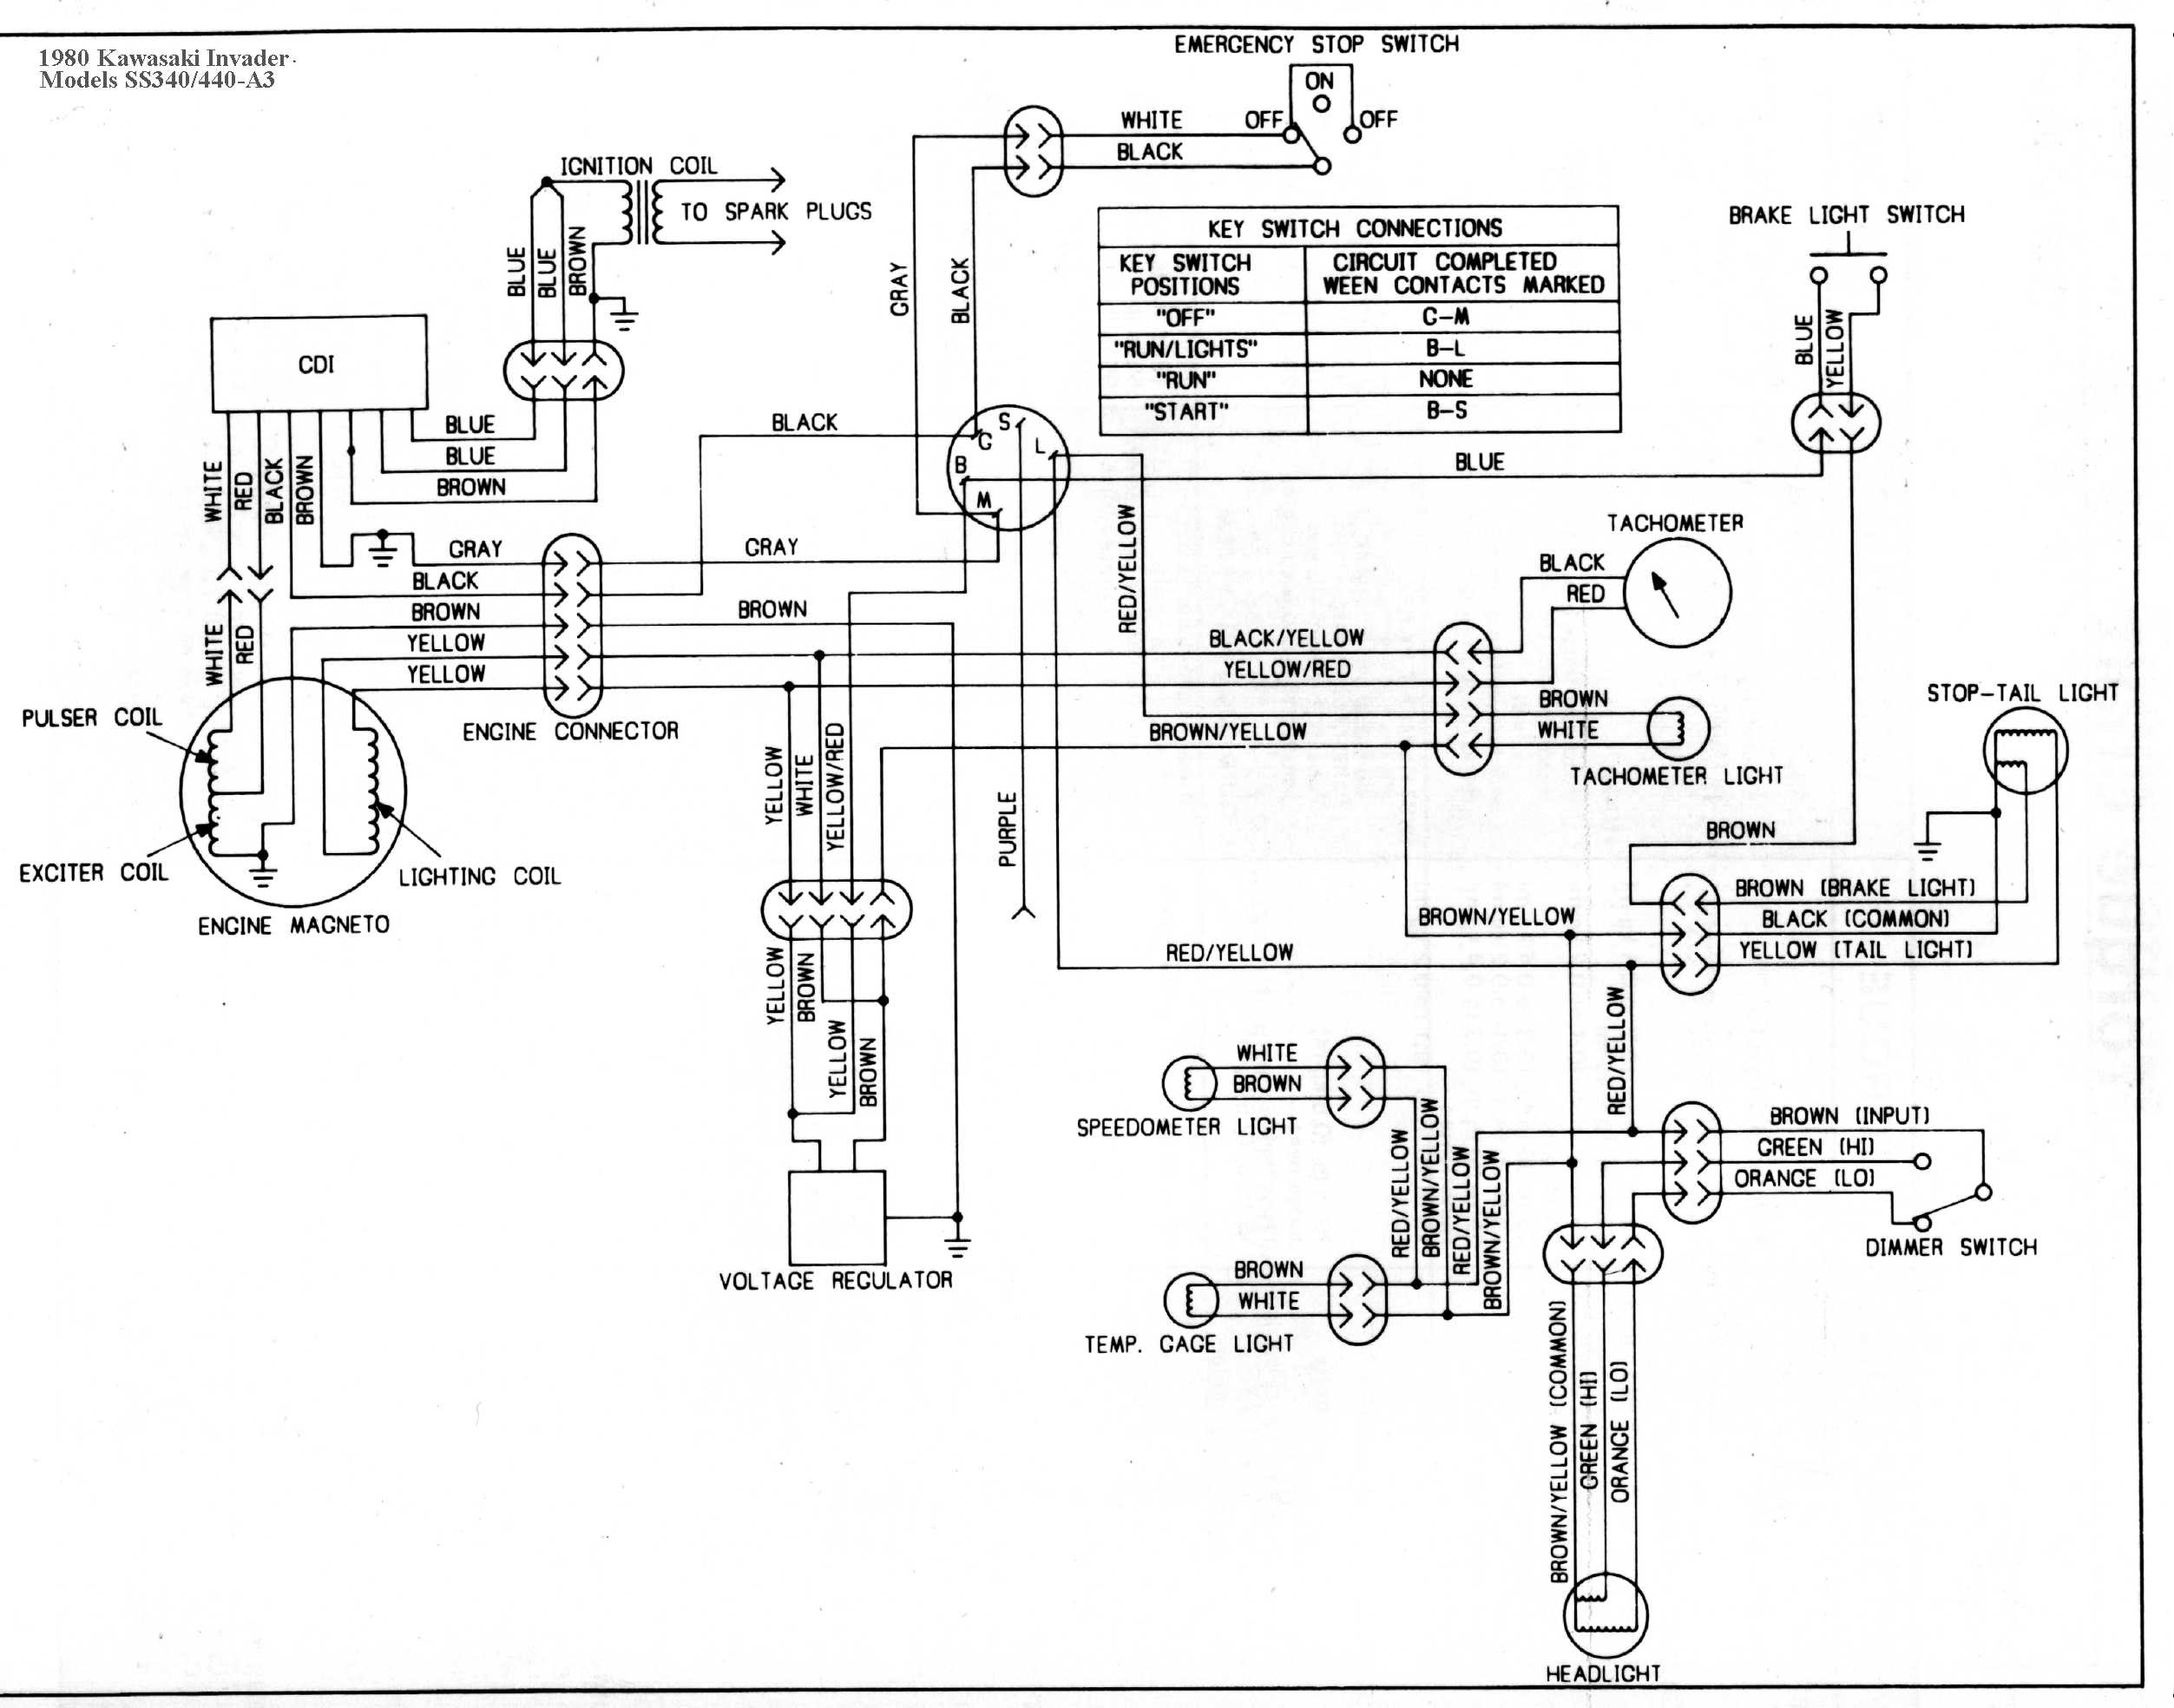 1980 Kawasaki Kz 1000 Wiring Diagrams